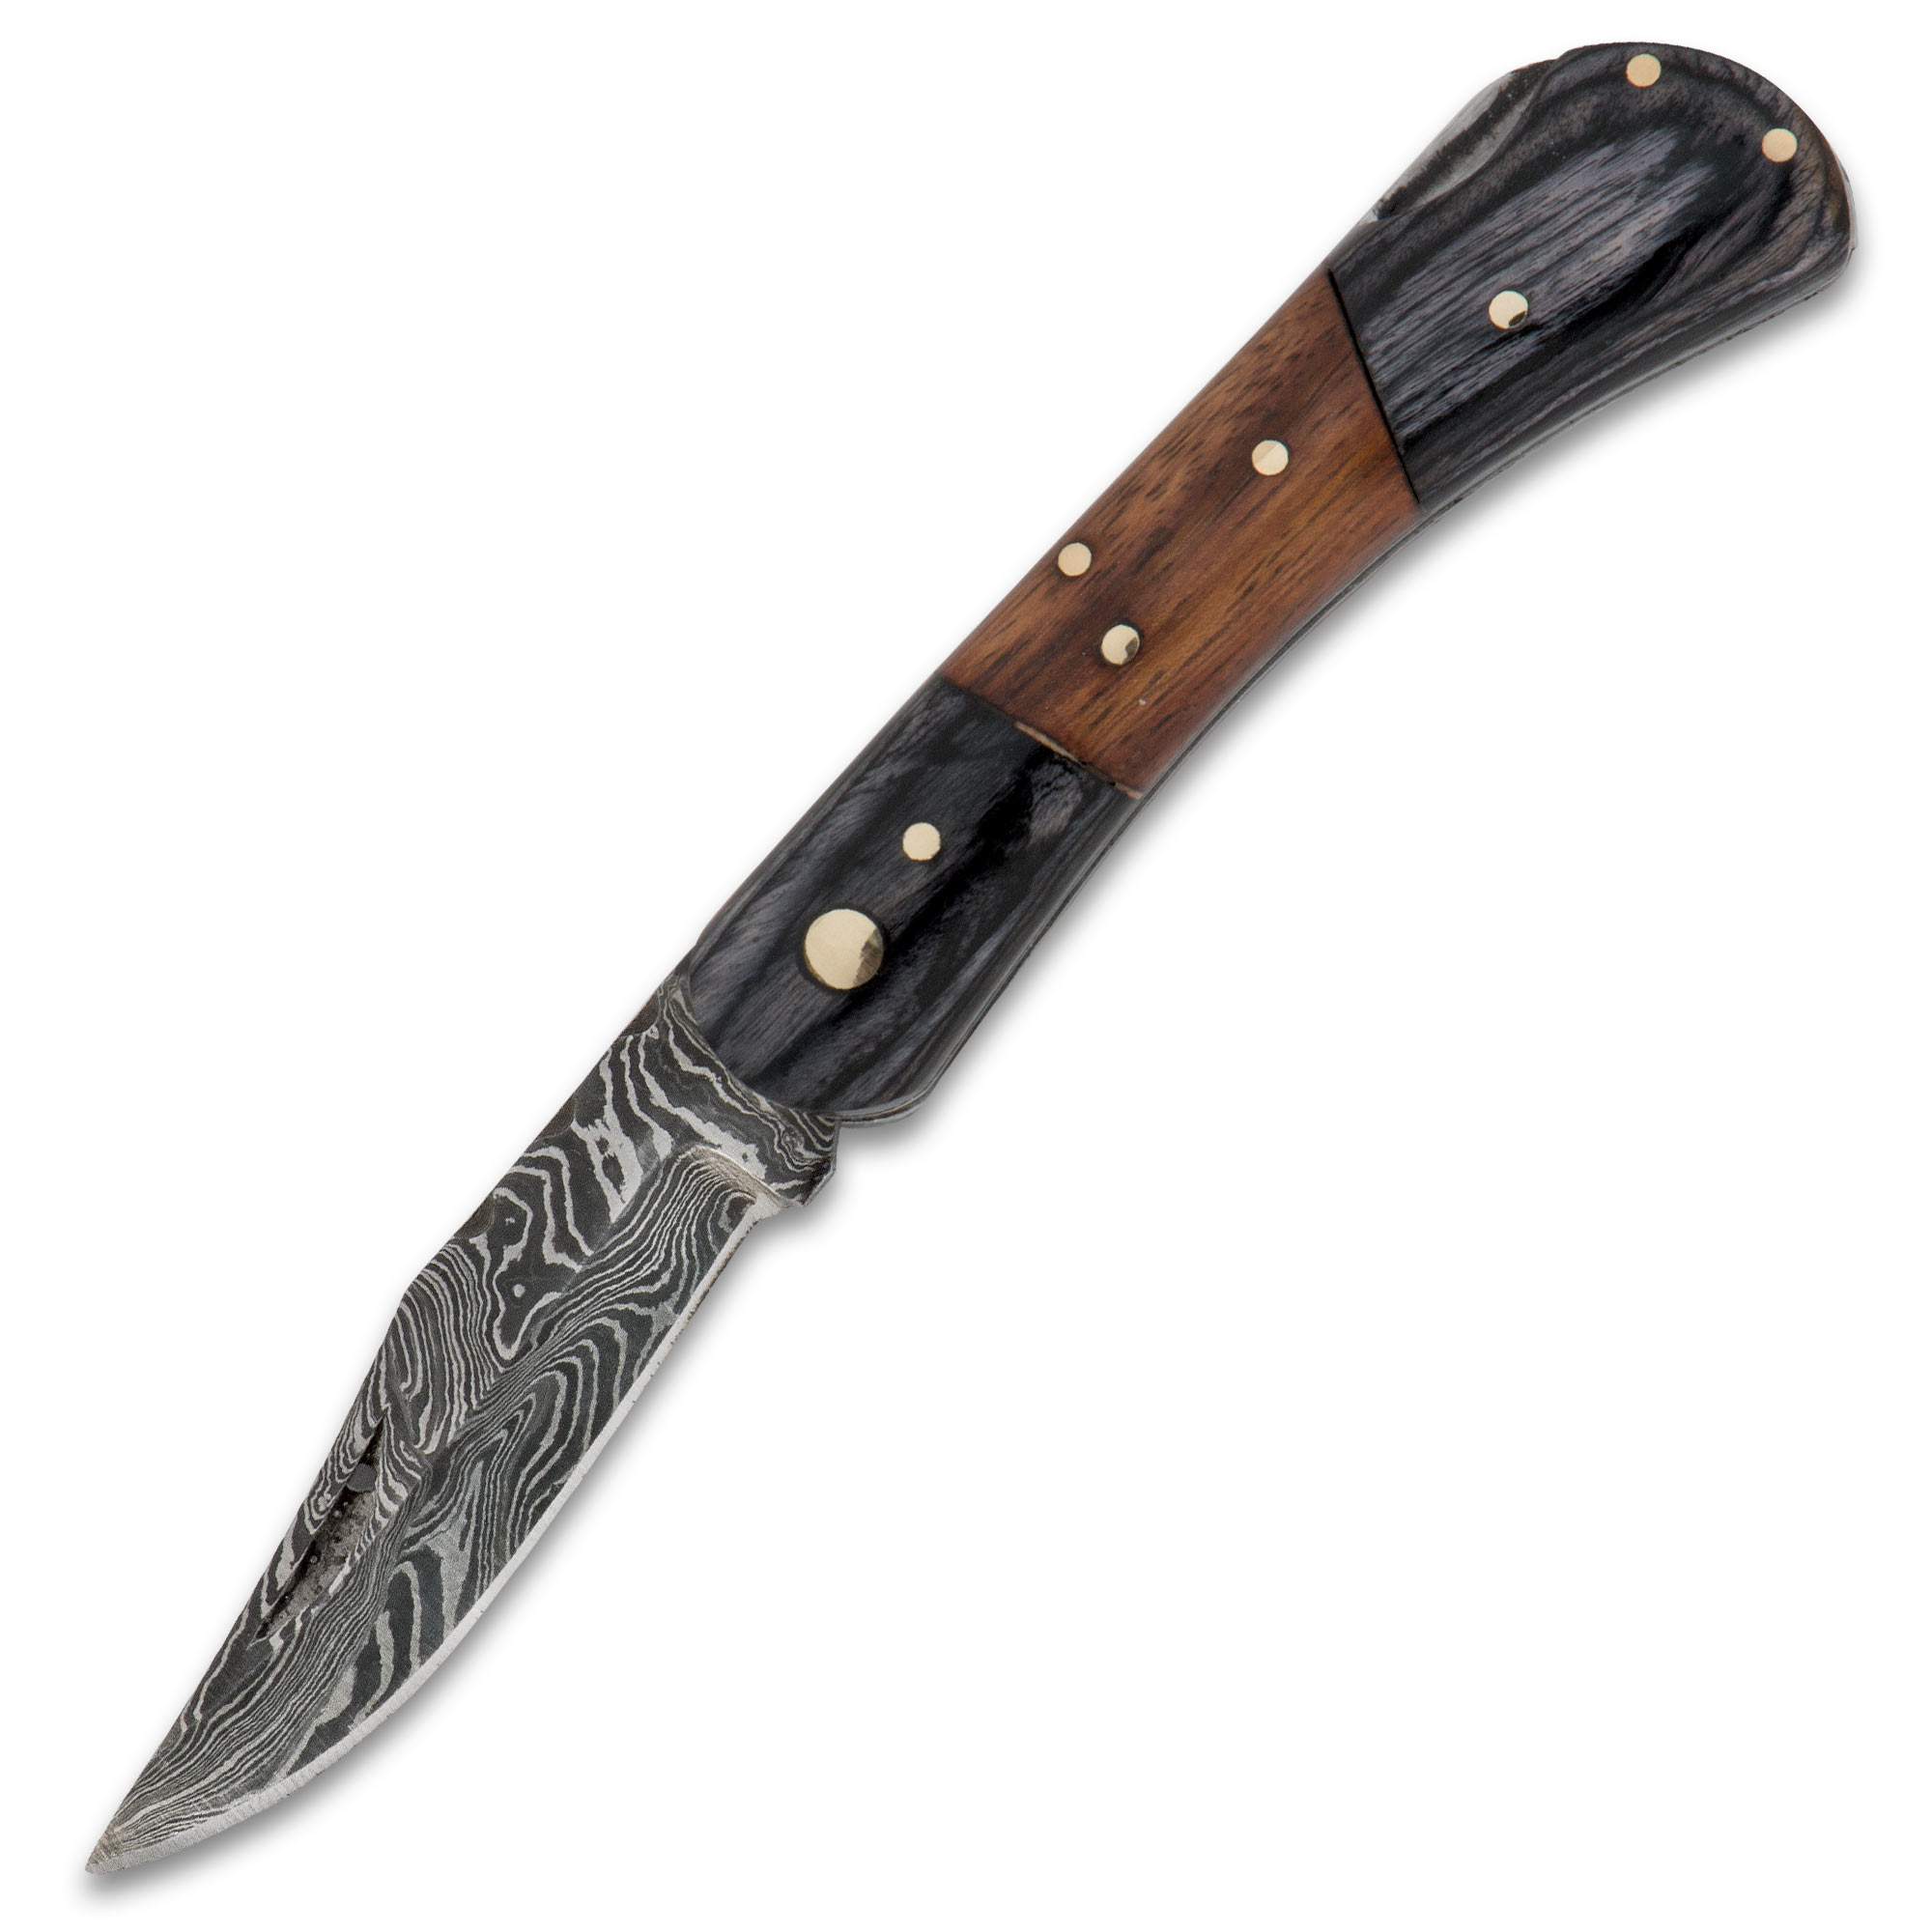 Timber Wolf File Worked Damascus Pocket Knife Chkadels